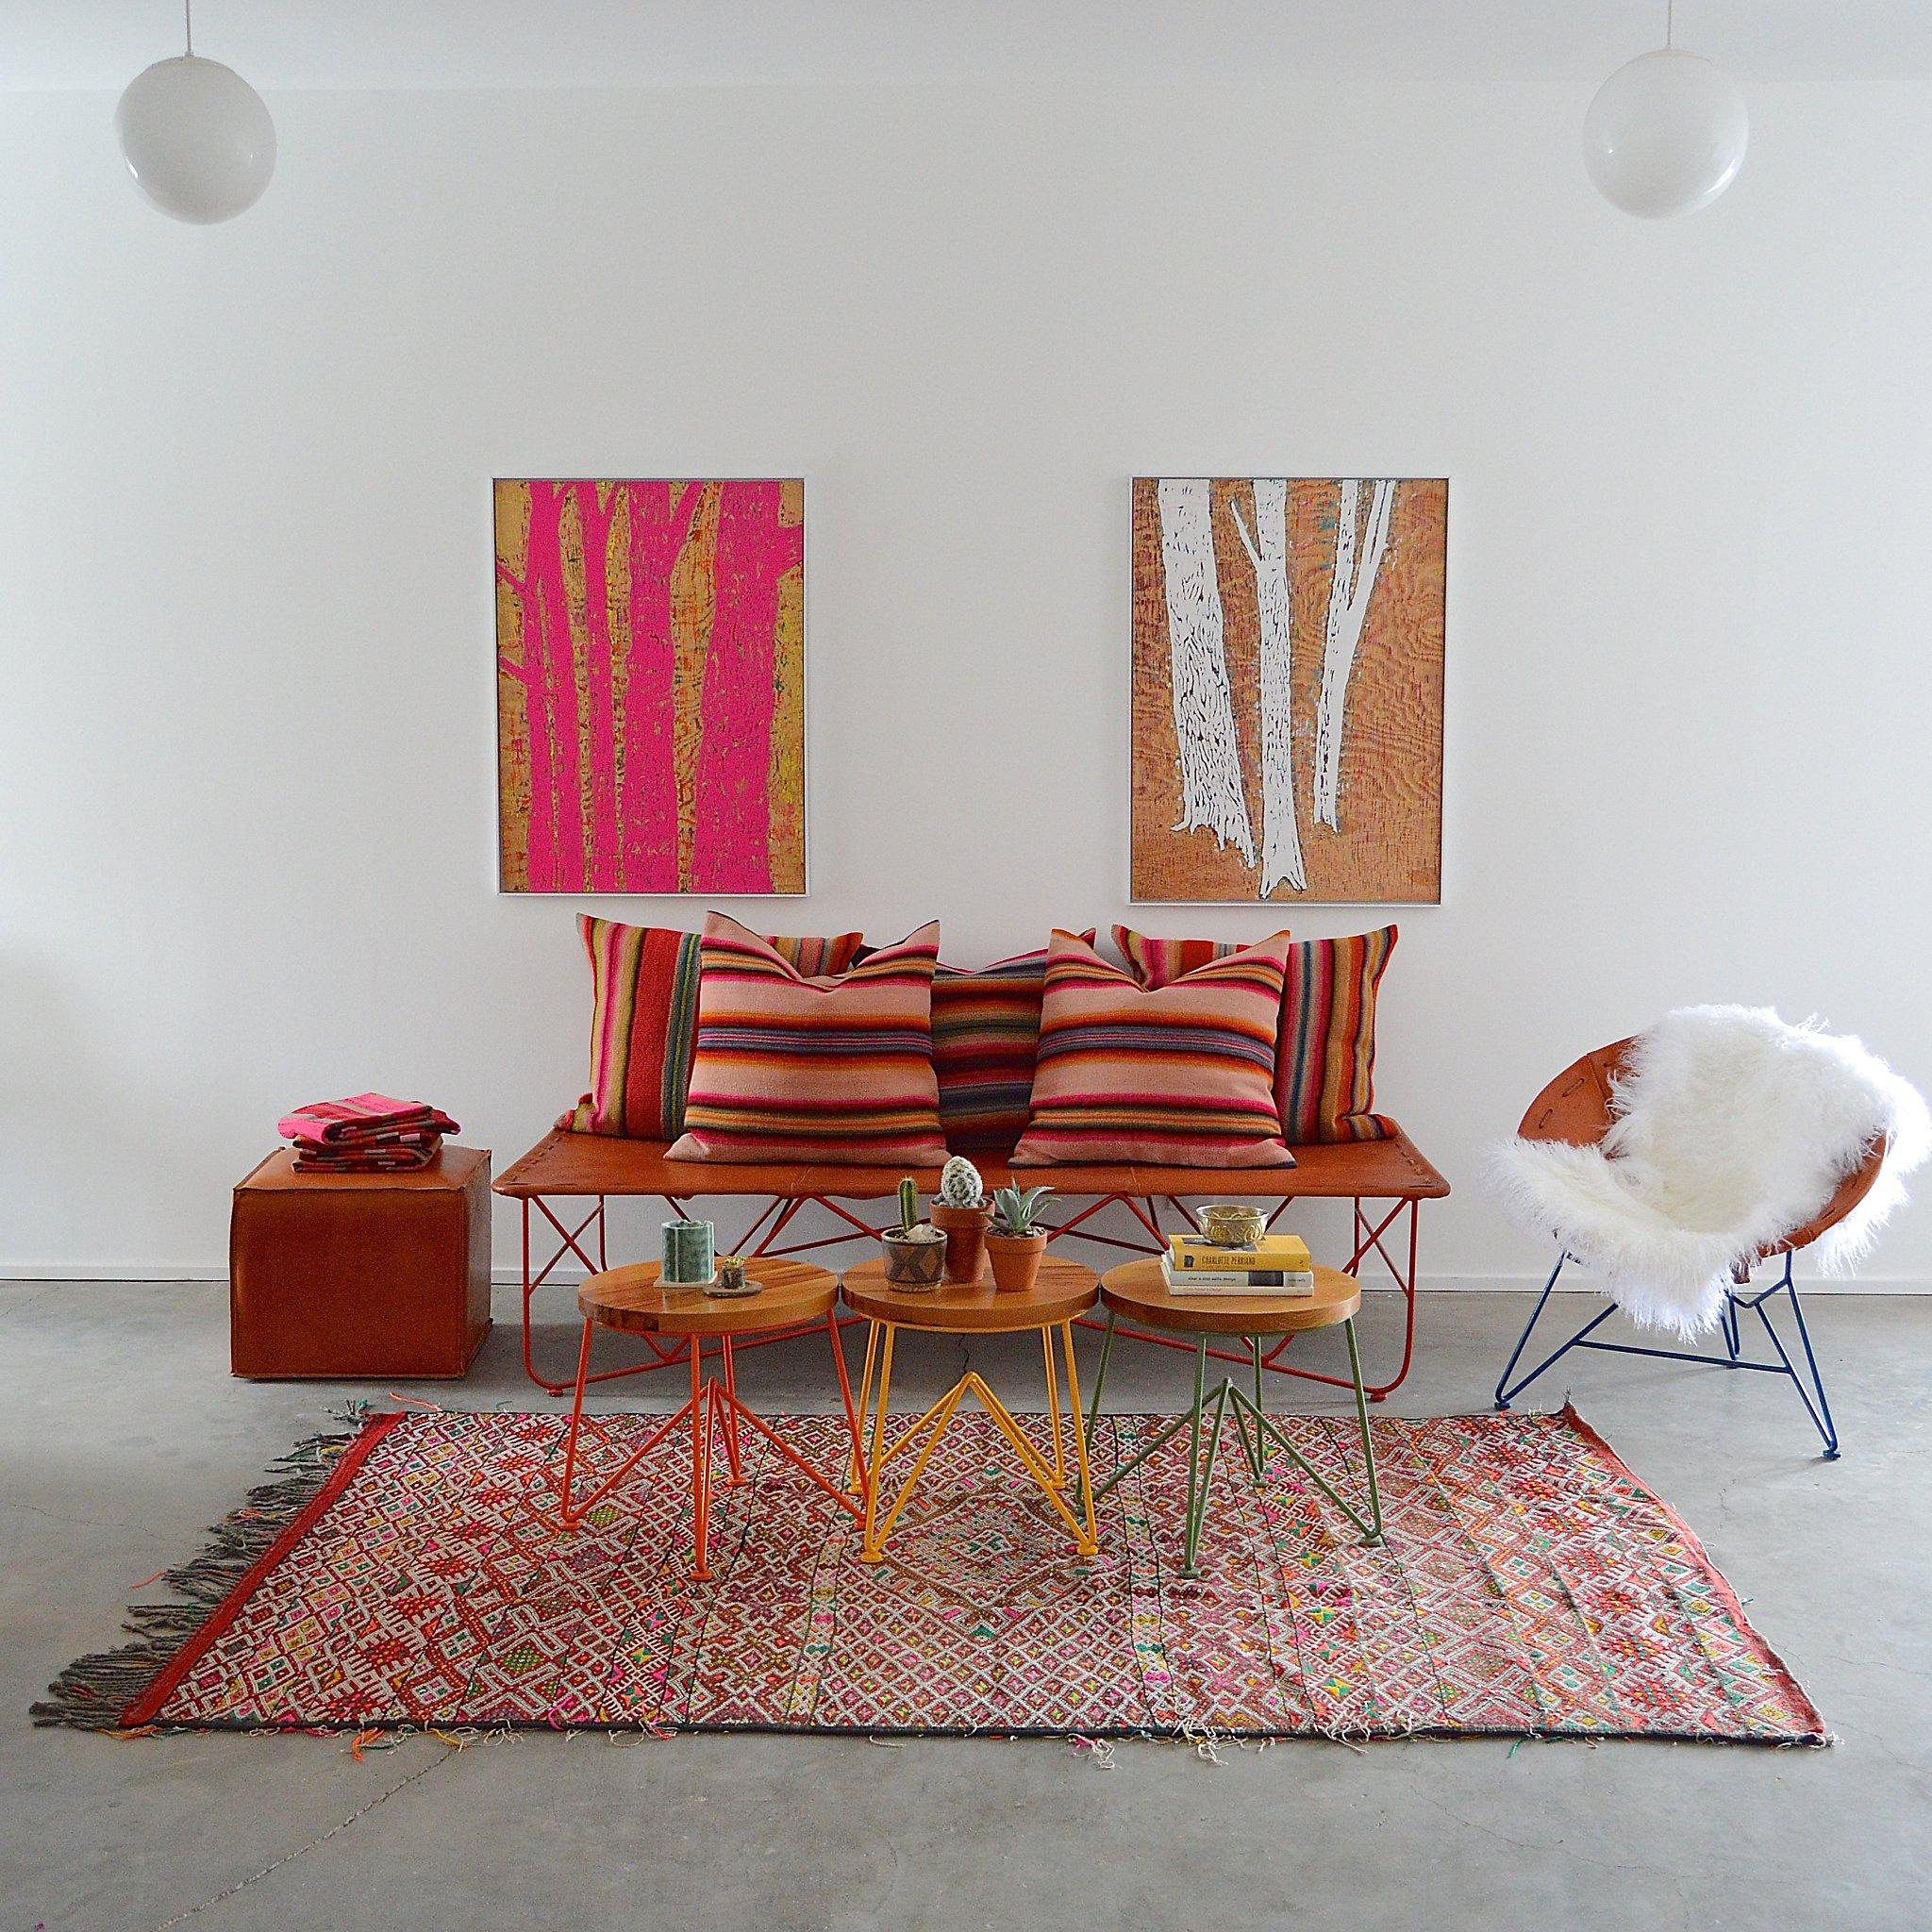 Home Goods Line Garza Marfa Reflects Texas Hues, Bay Area